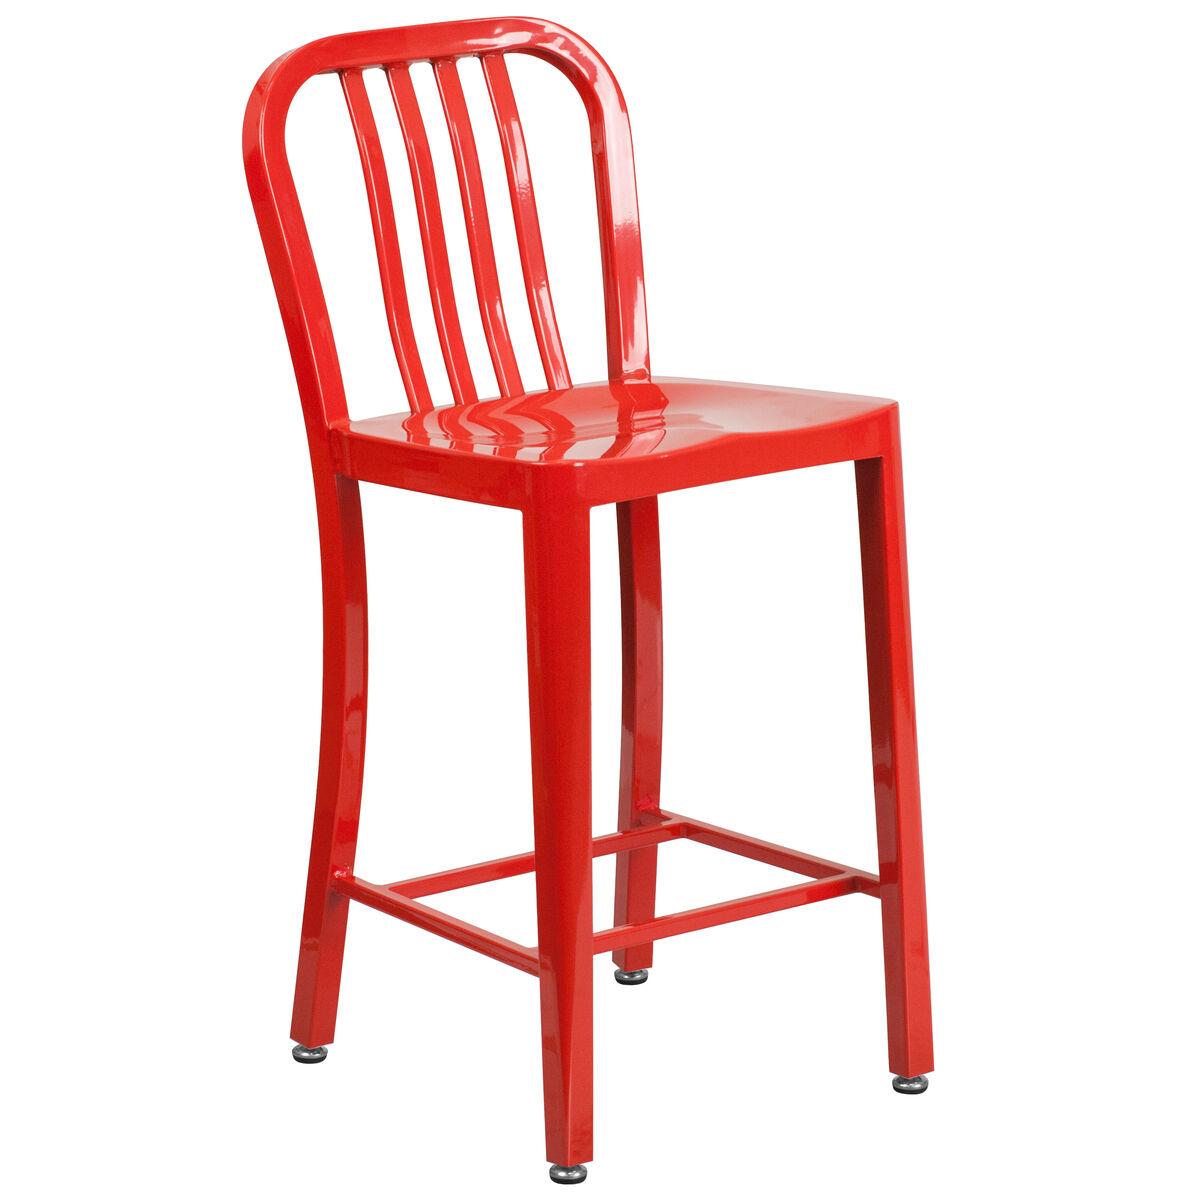 24 Quot Red Metal Outdoor Stool Ch 61200 24 Red Gg Bizchair Com